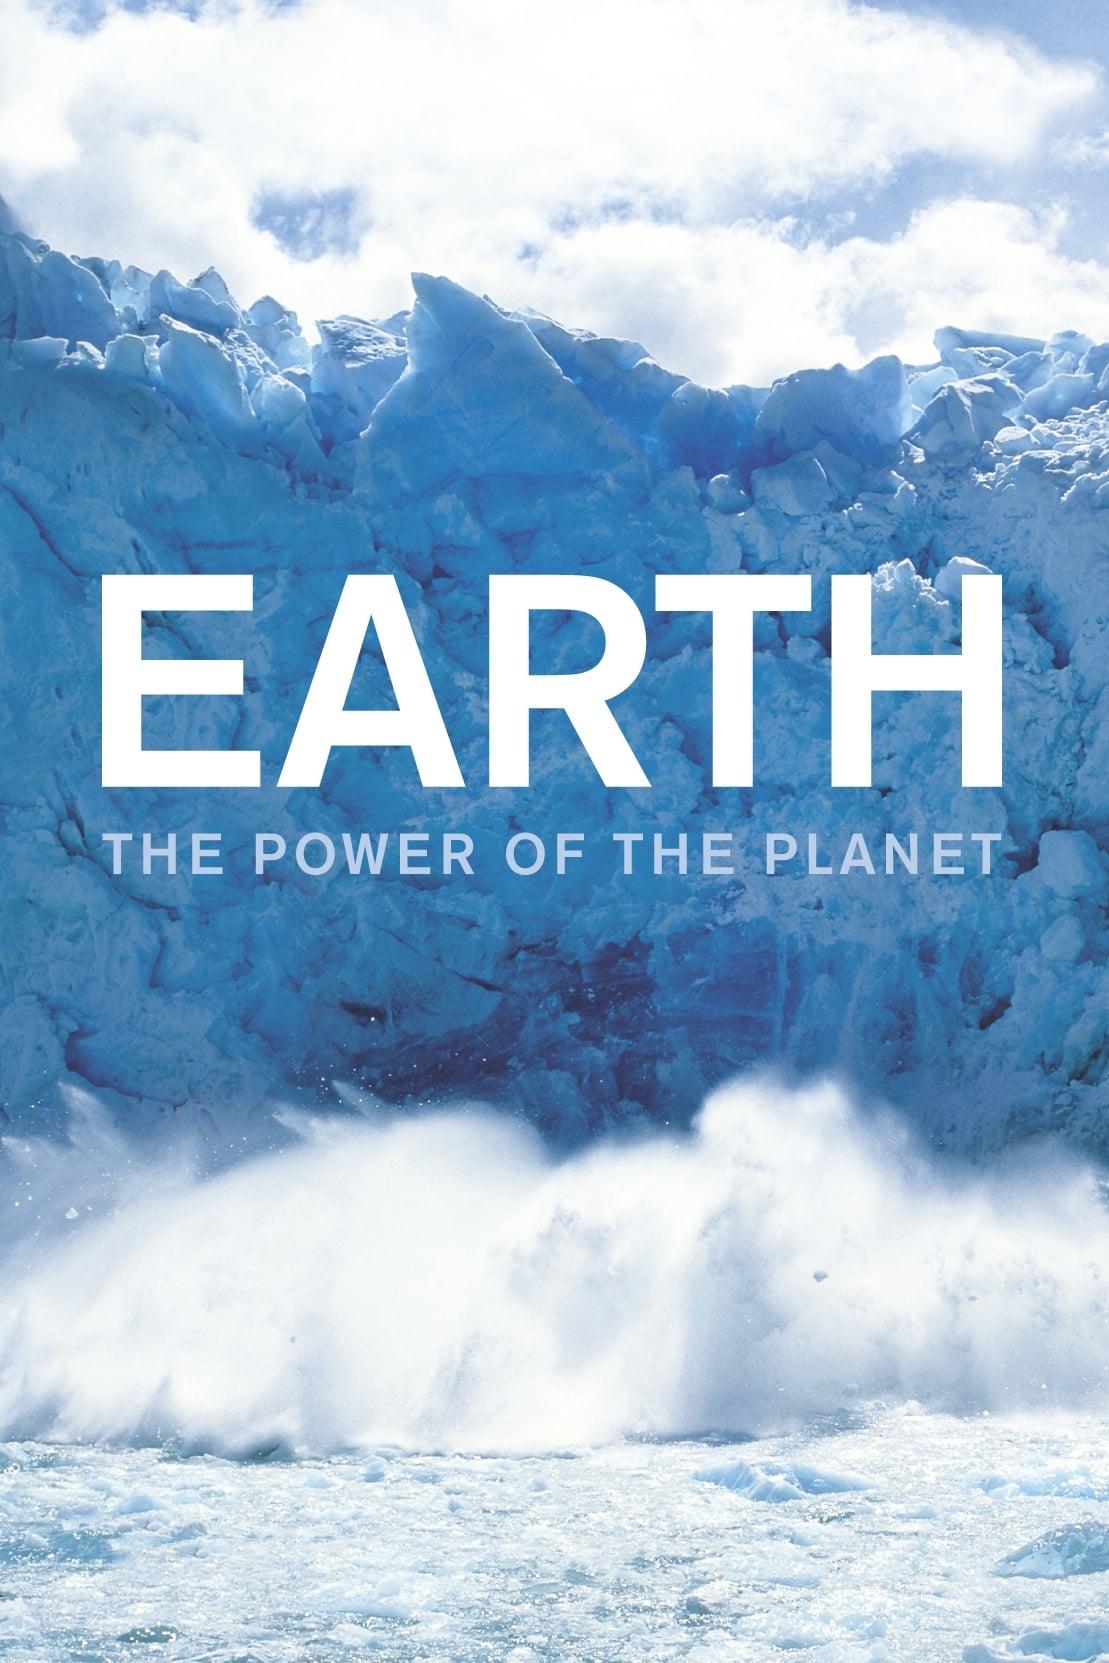 TV Shows Like Planet Earth